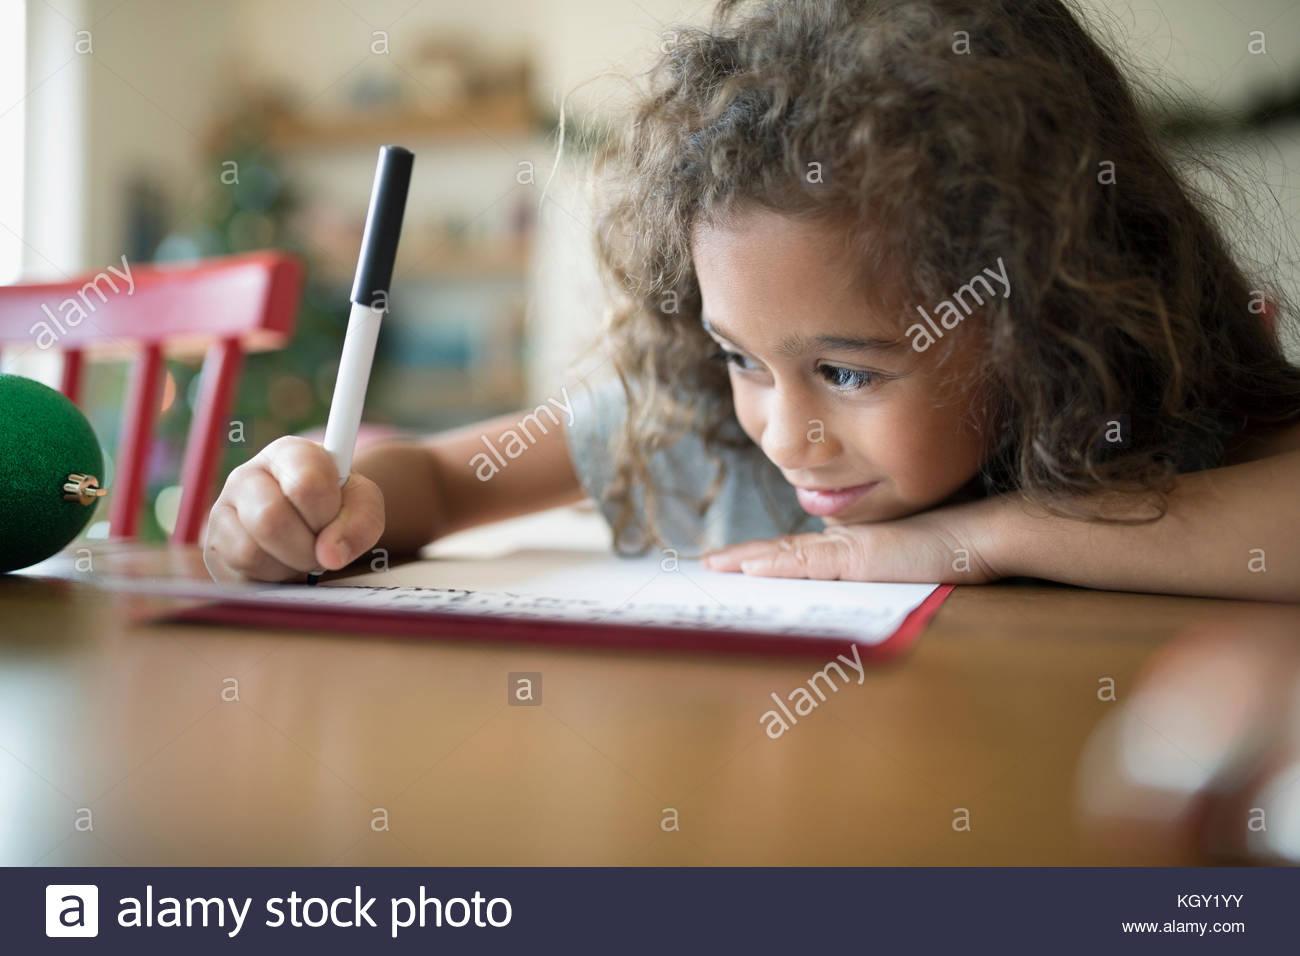 Smiling girl writing Christmas letter to Santa at table - Stock Image